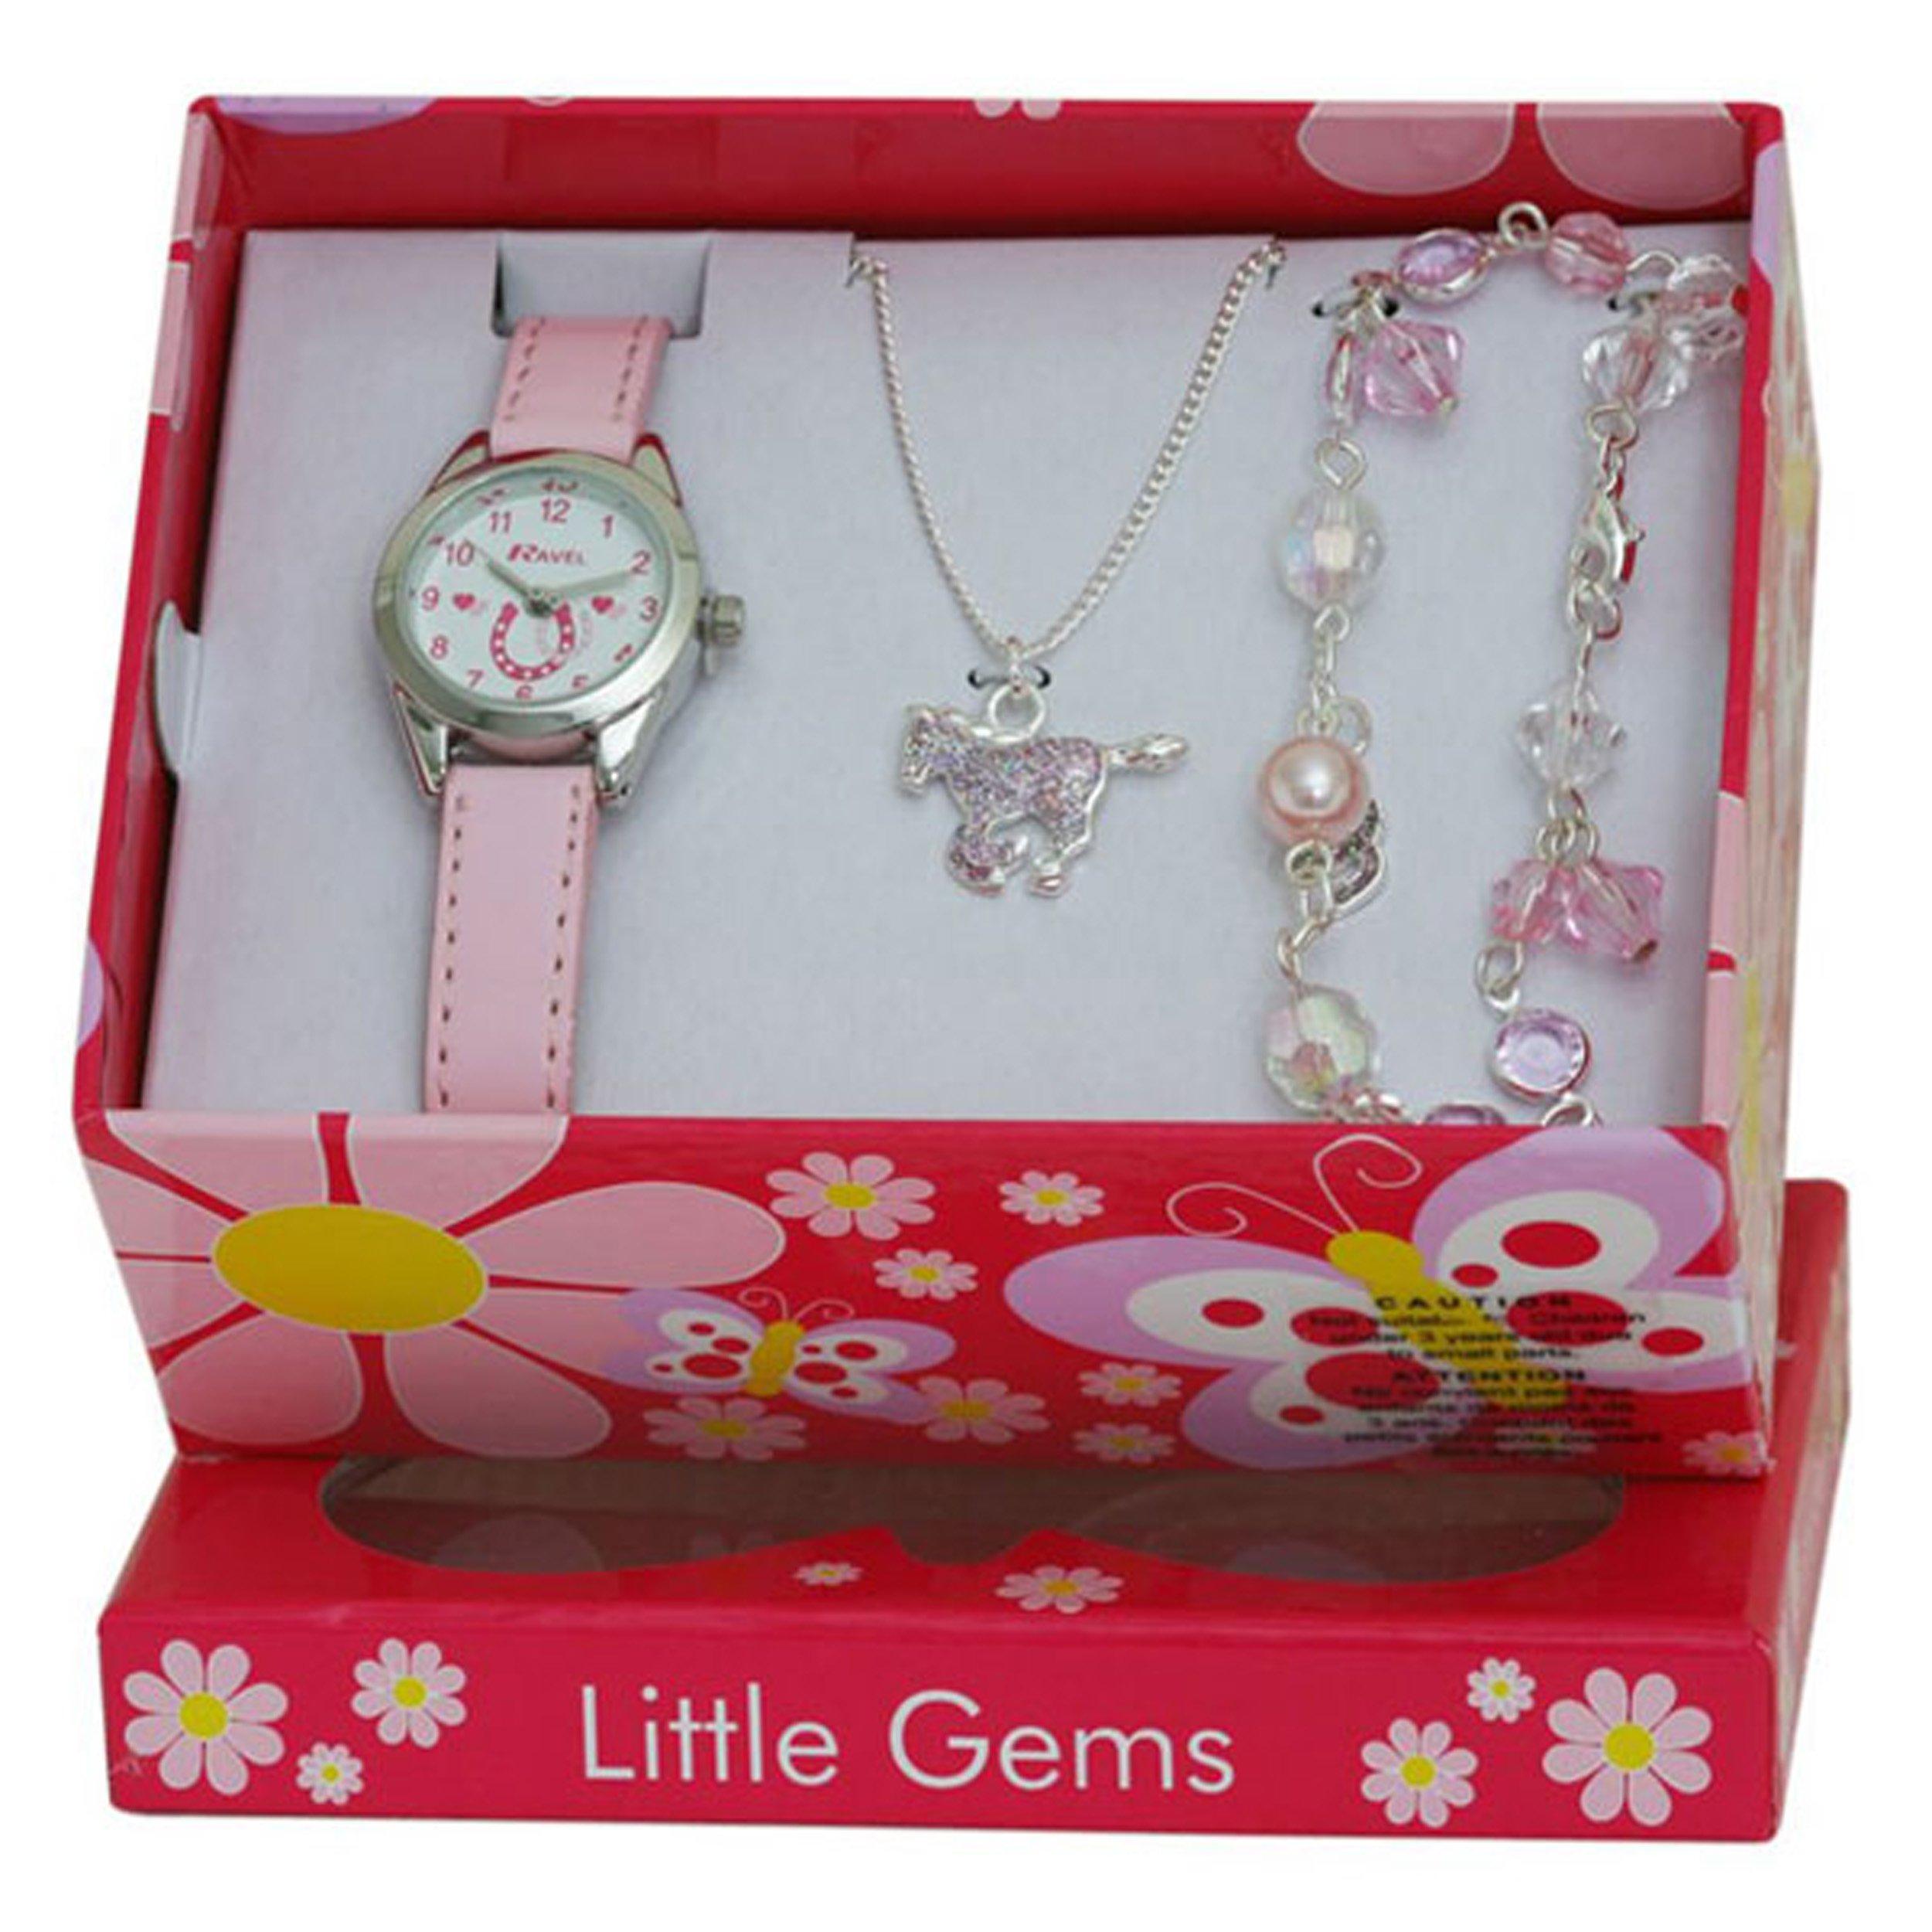 Ravel Little Gems Kids Horse Watch & Jewellery Gift Set For Girls R2213